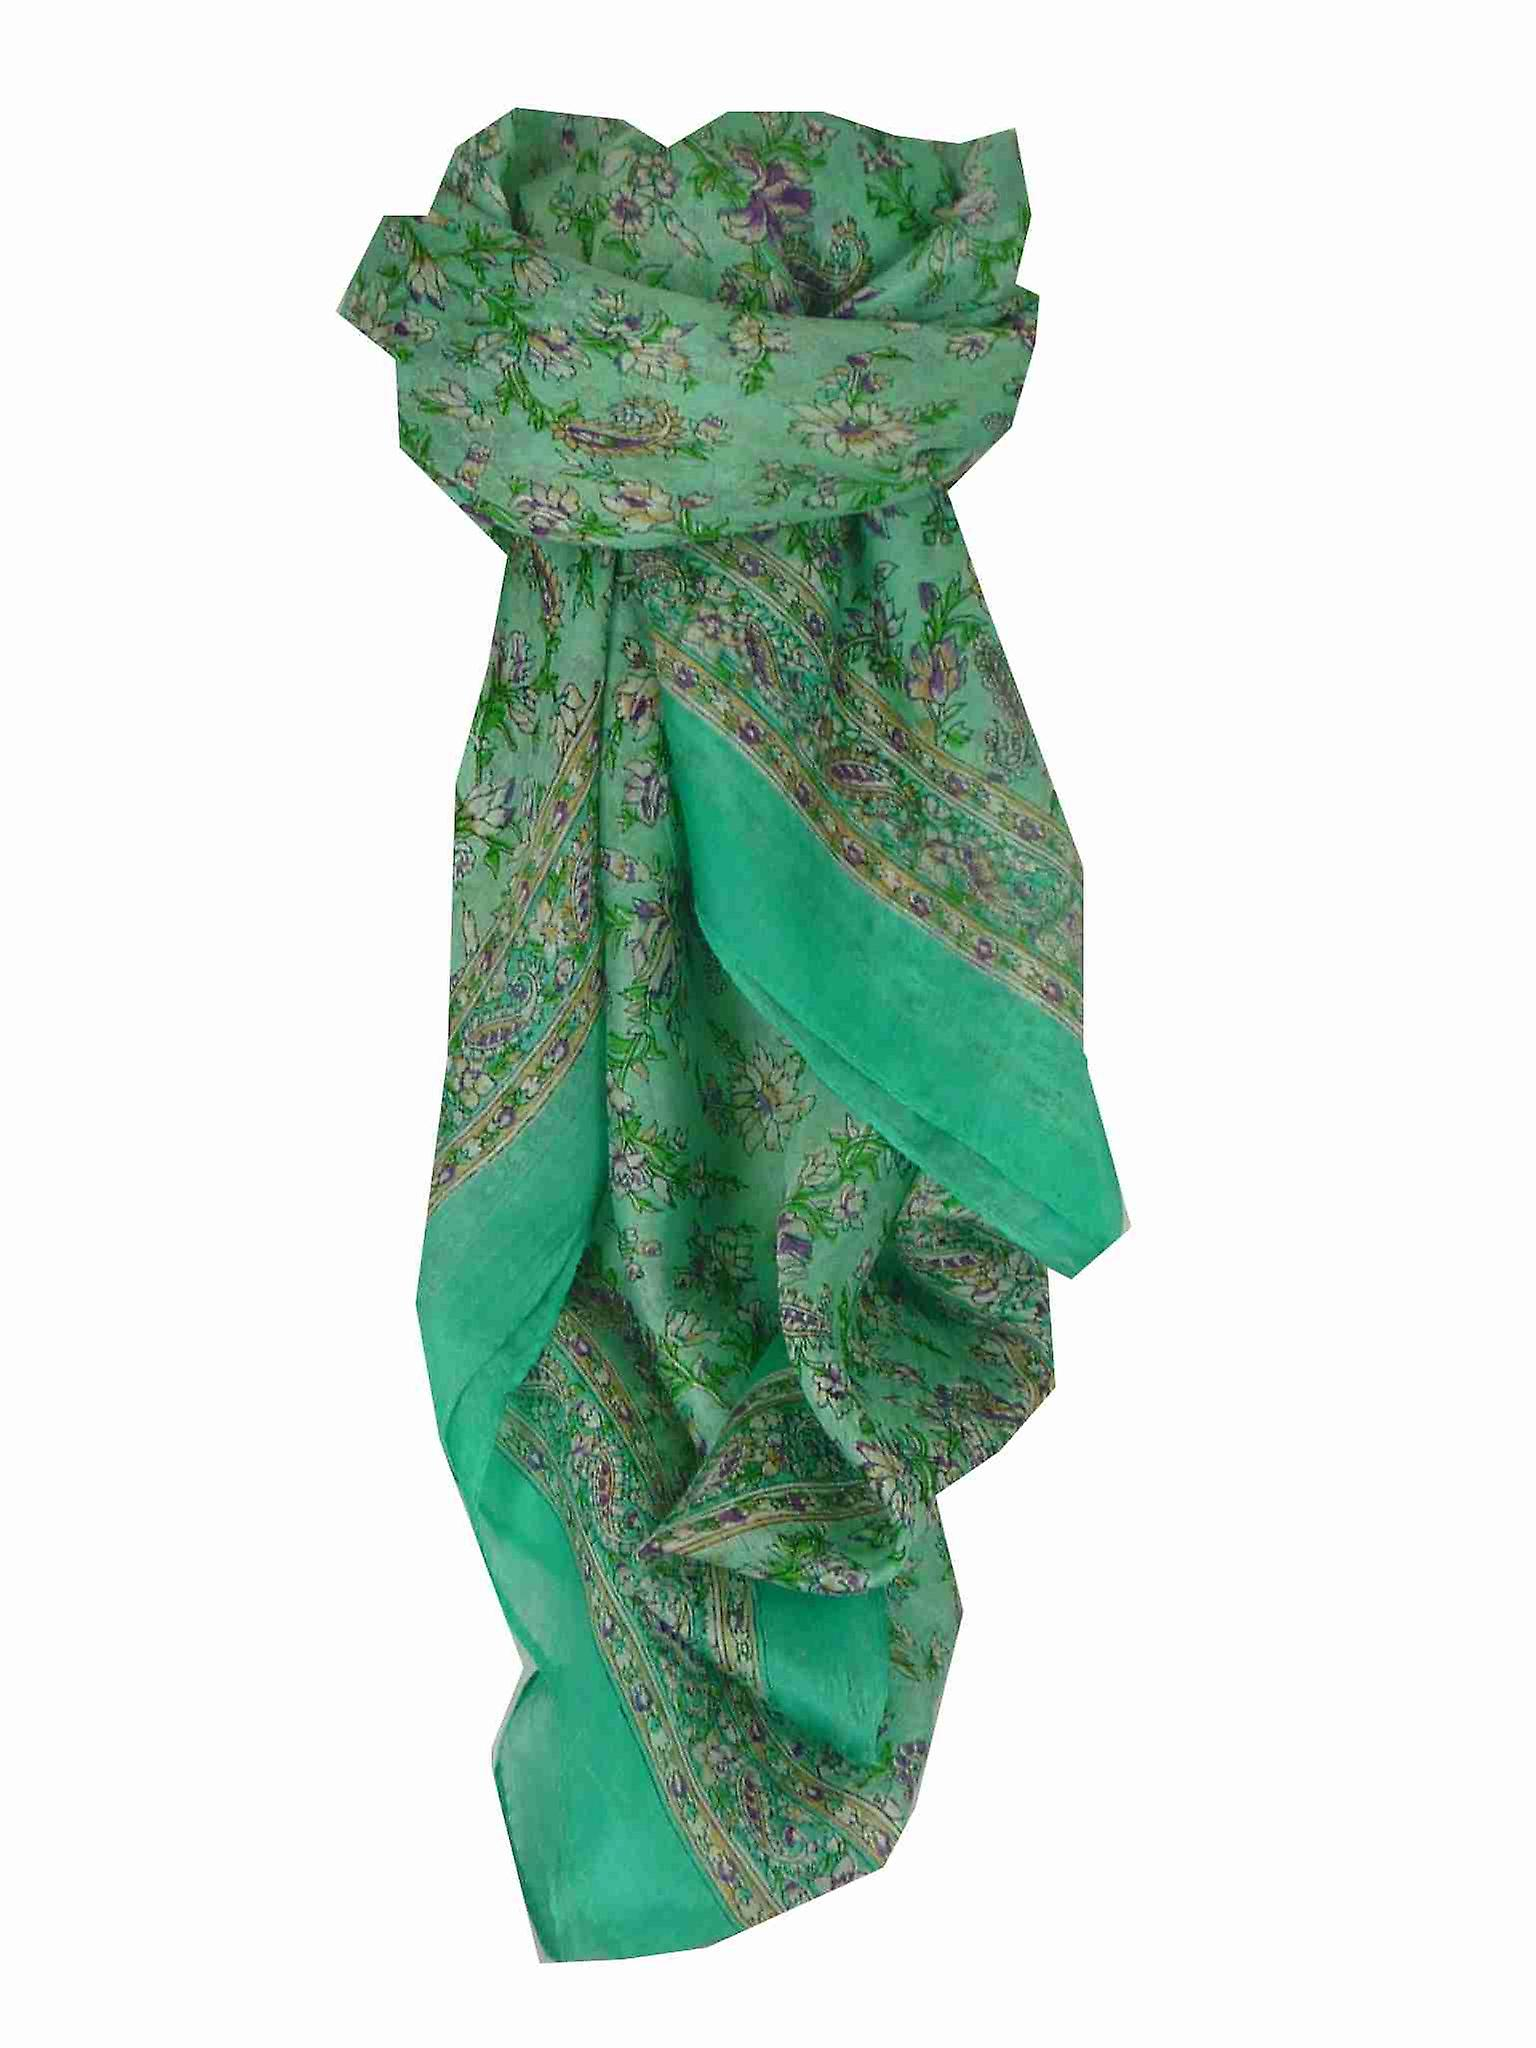 Mulberry Silk Traditional Square Scarf Ela Aquamarine by Pashmina & Silk